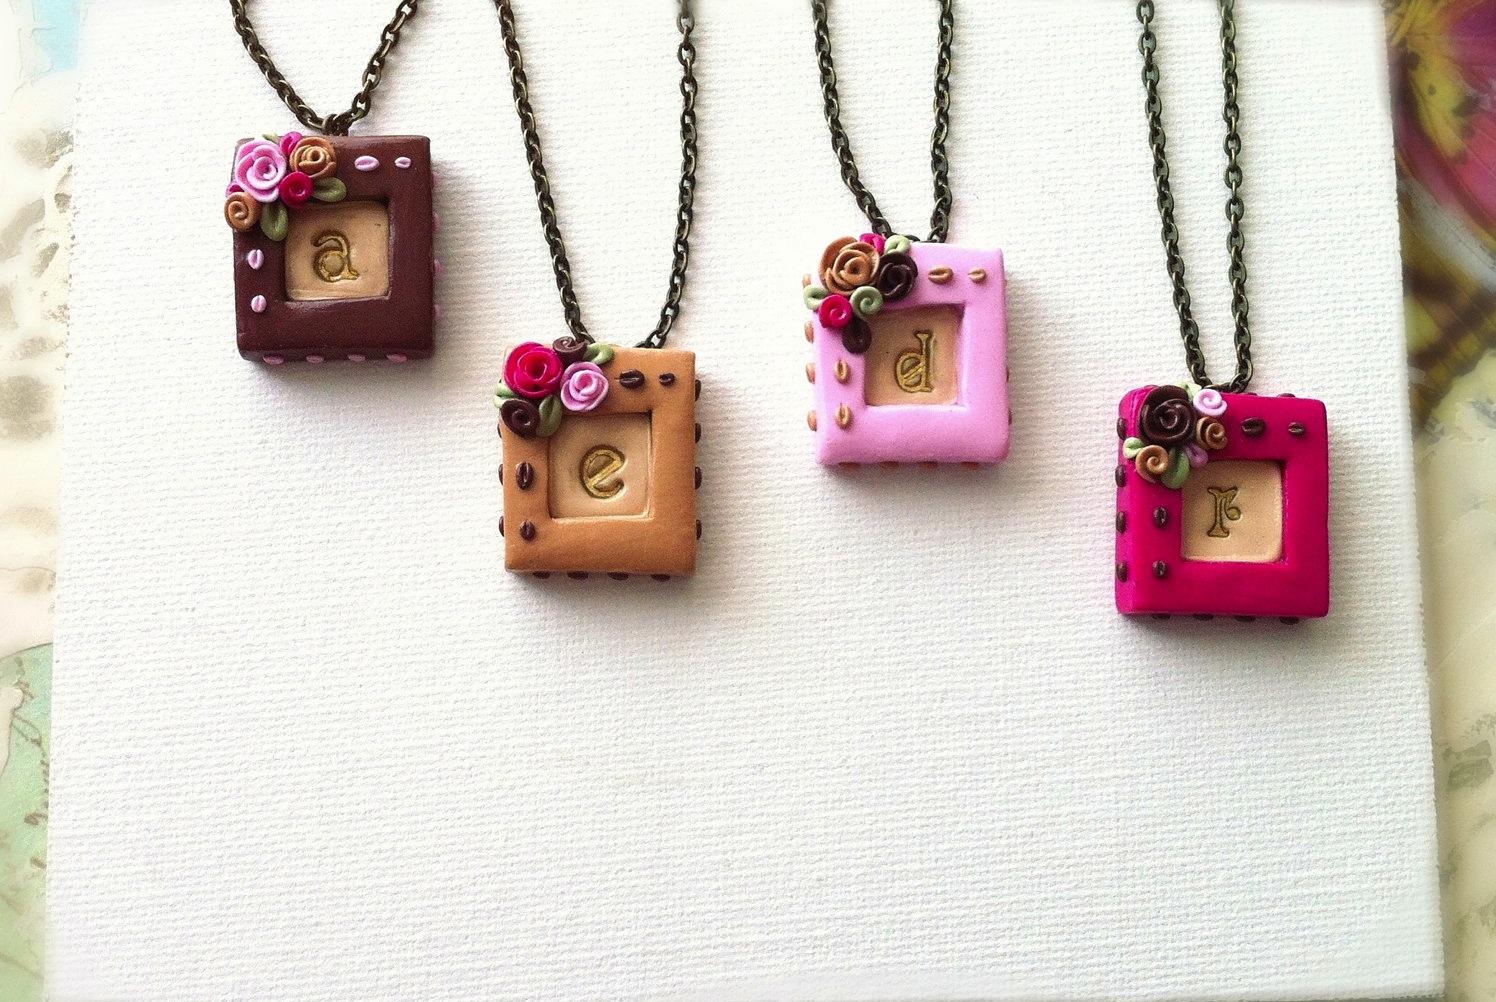 Unique Wedding Gifts For Bridesmaids : Unique-wedding-gifts-for-bridesmaids-initial-jewelry-accessories-3 ...